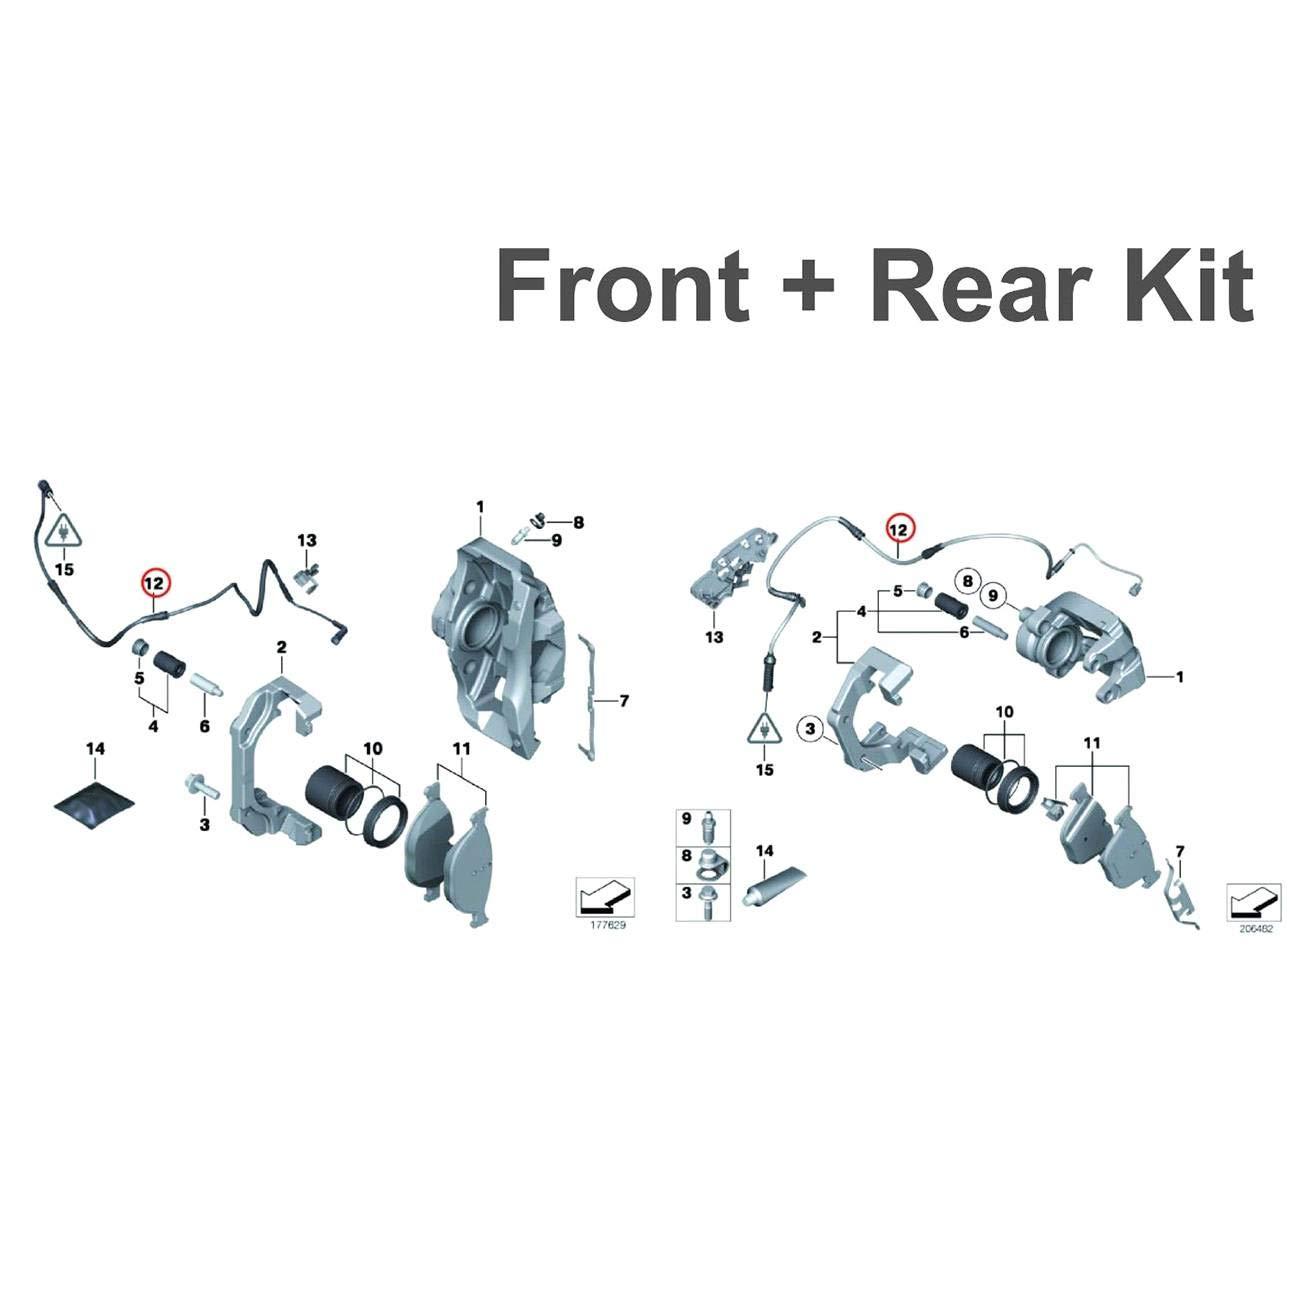 Vioji 2pcs Front Right Brake Pad Sensor Kit For Bmw 7 Electrical Wiring Diagram 760 Series 2011 2014 740li 2010 740i 2009 750li 750i